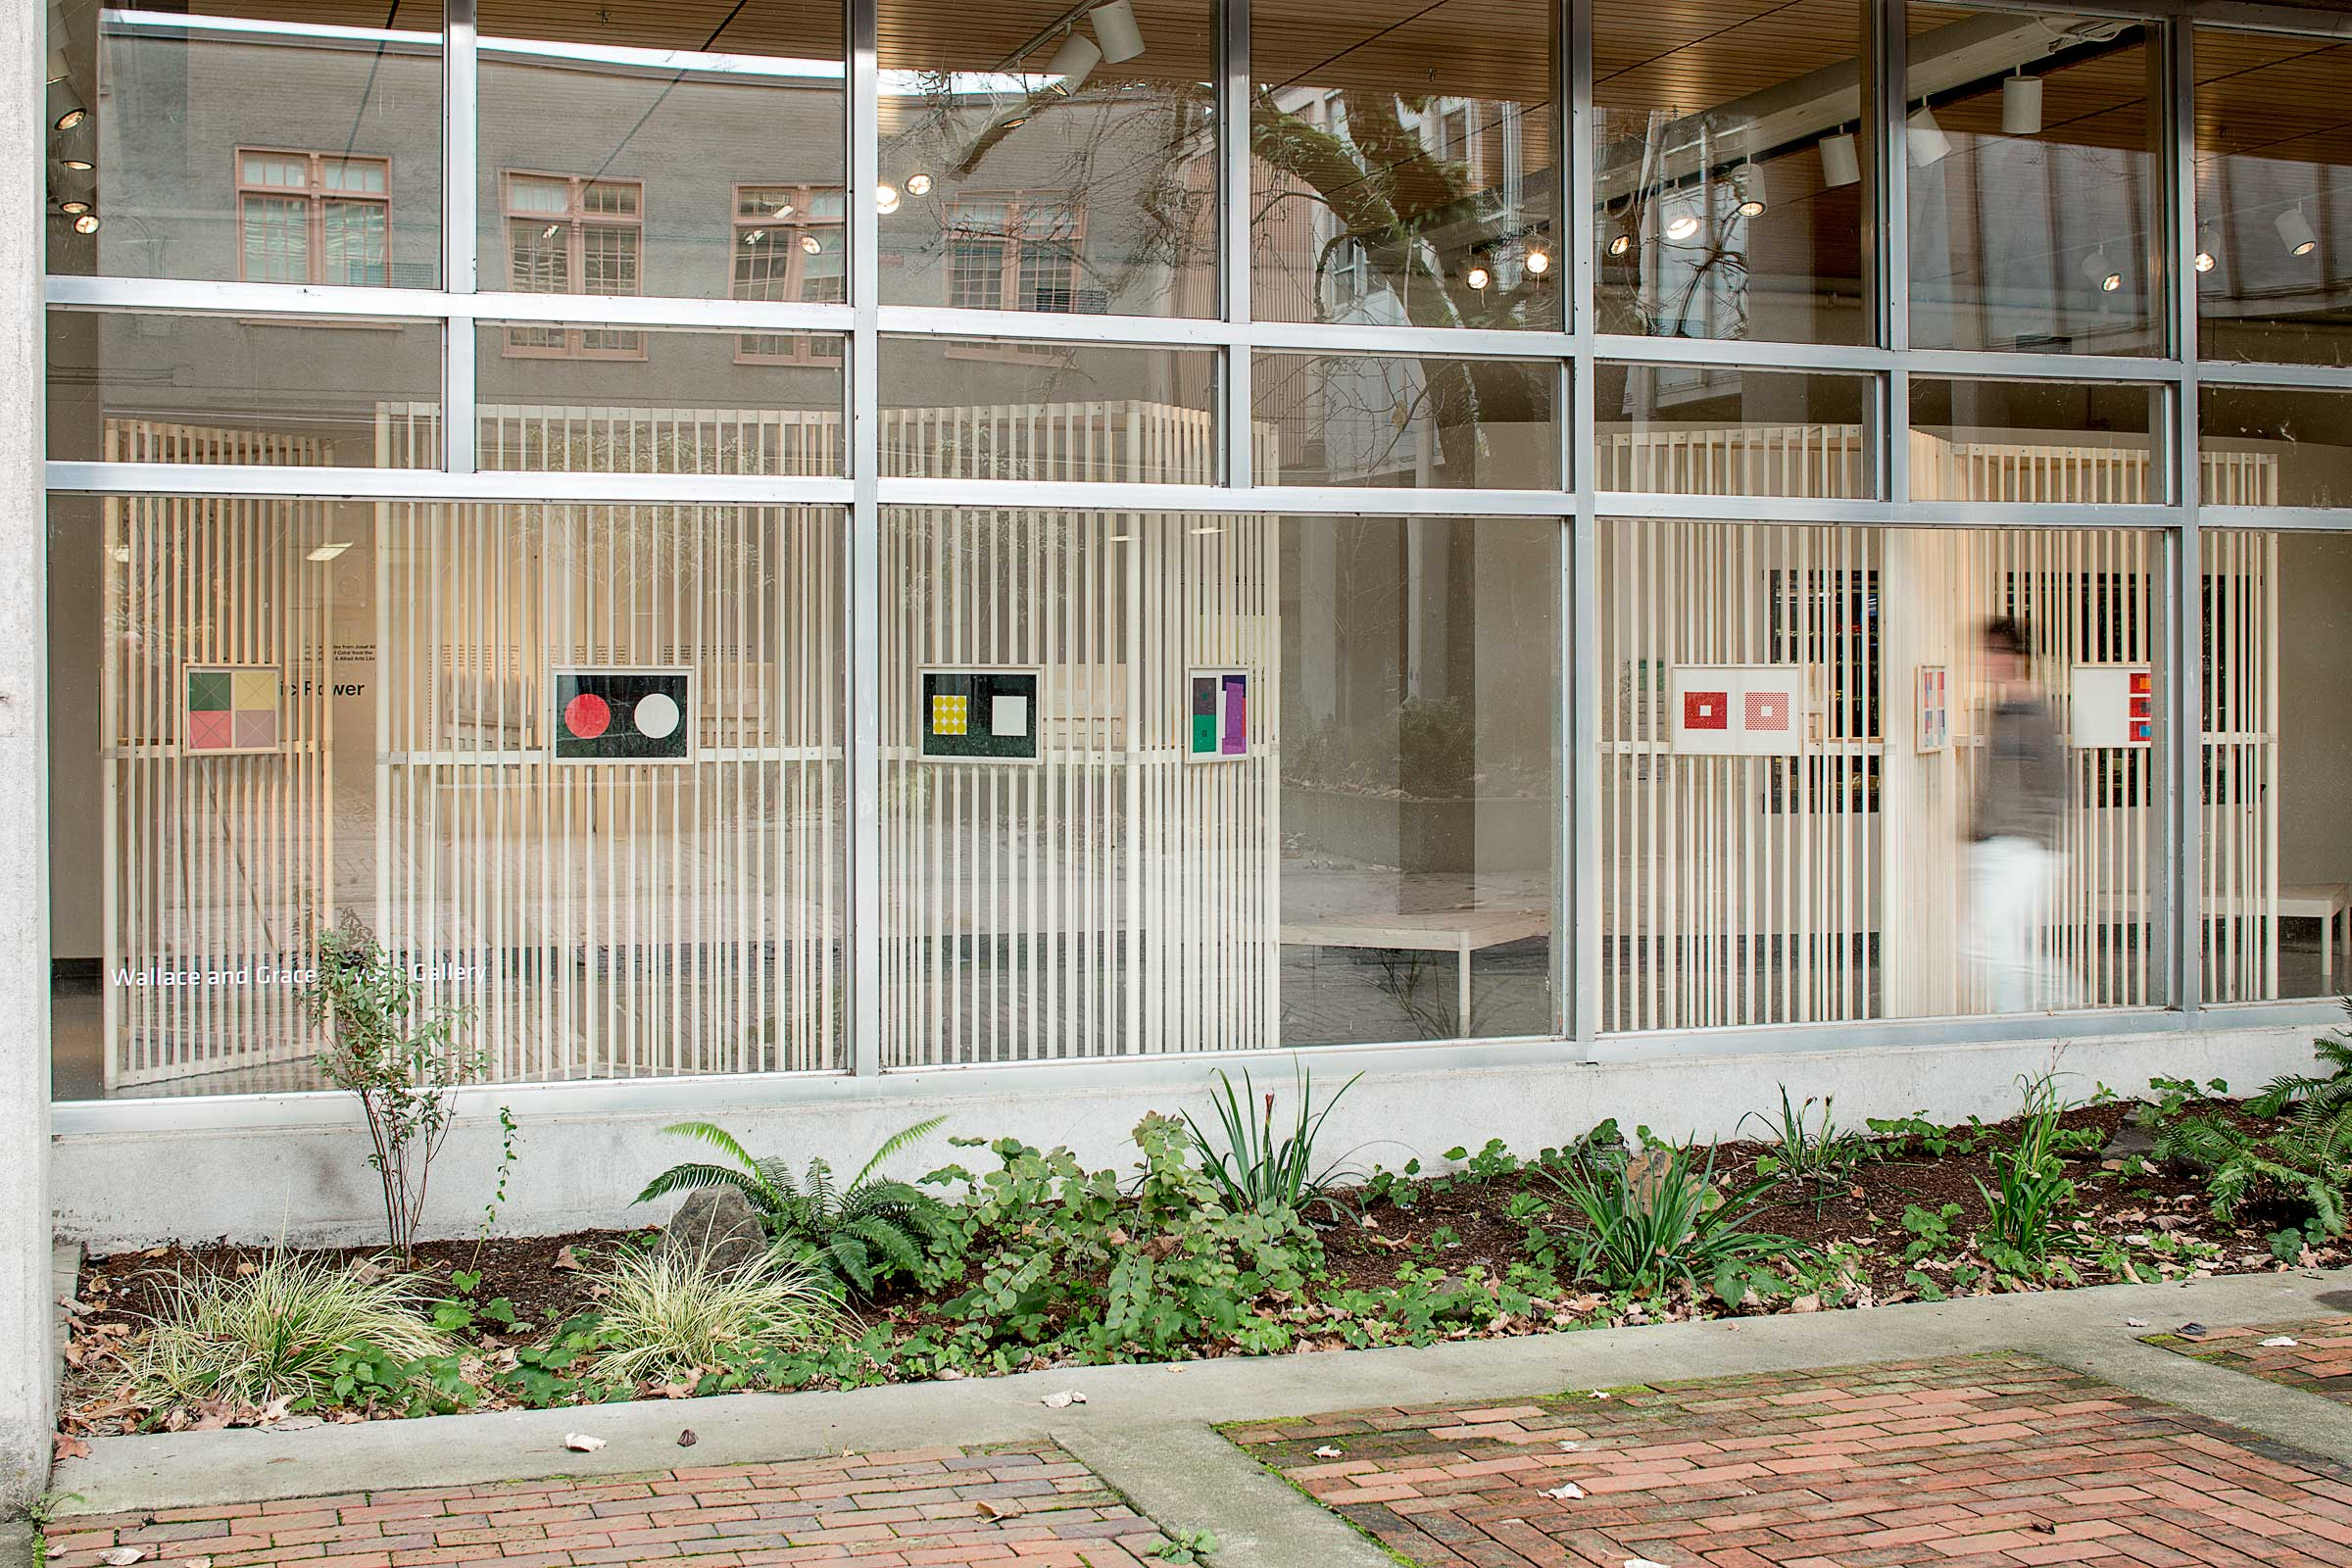 Josef Albers Exhibition. Exterior view